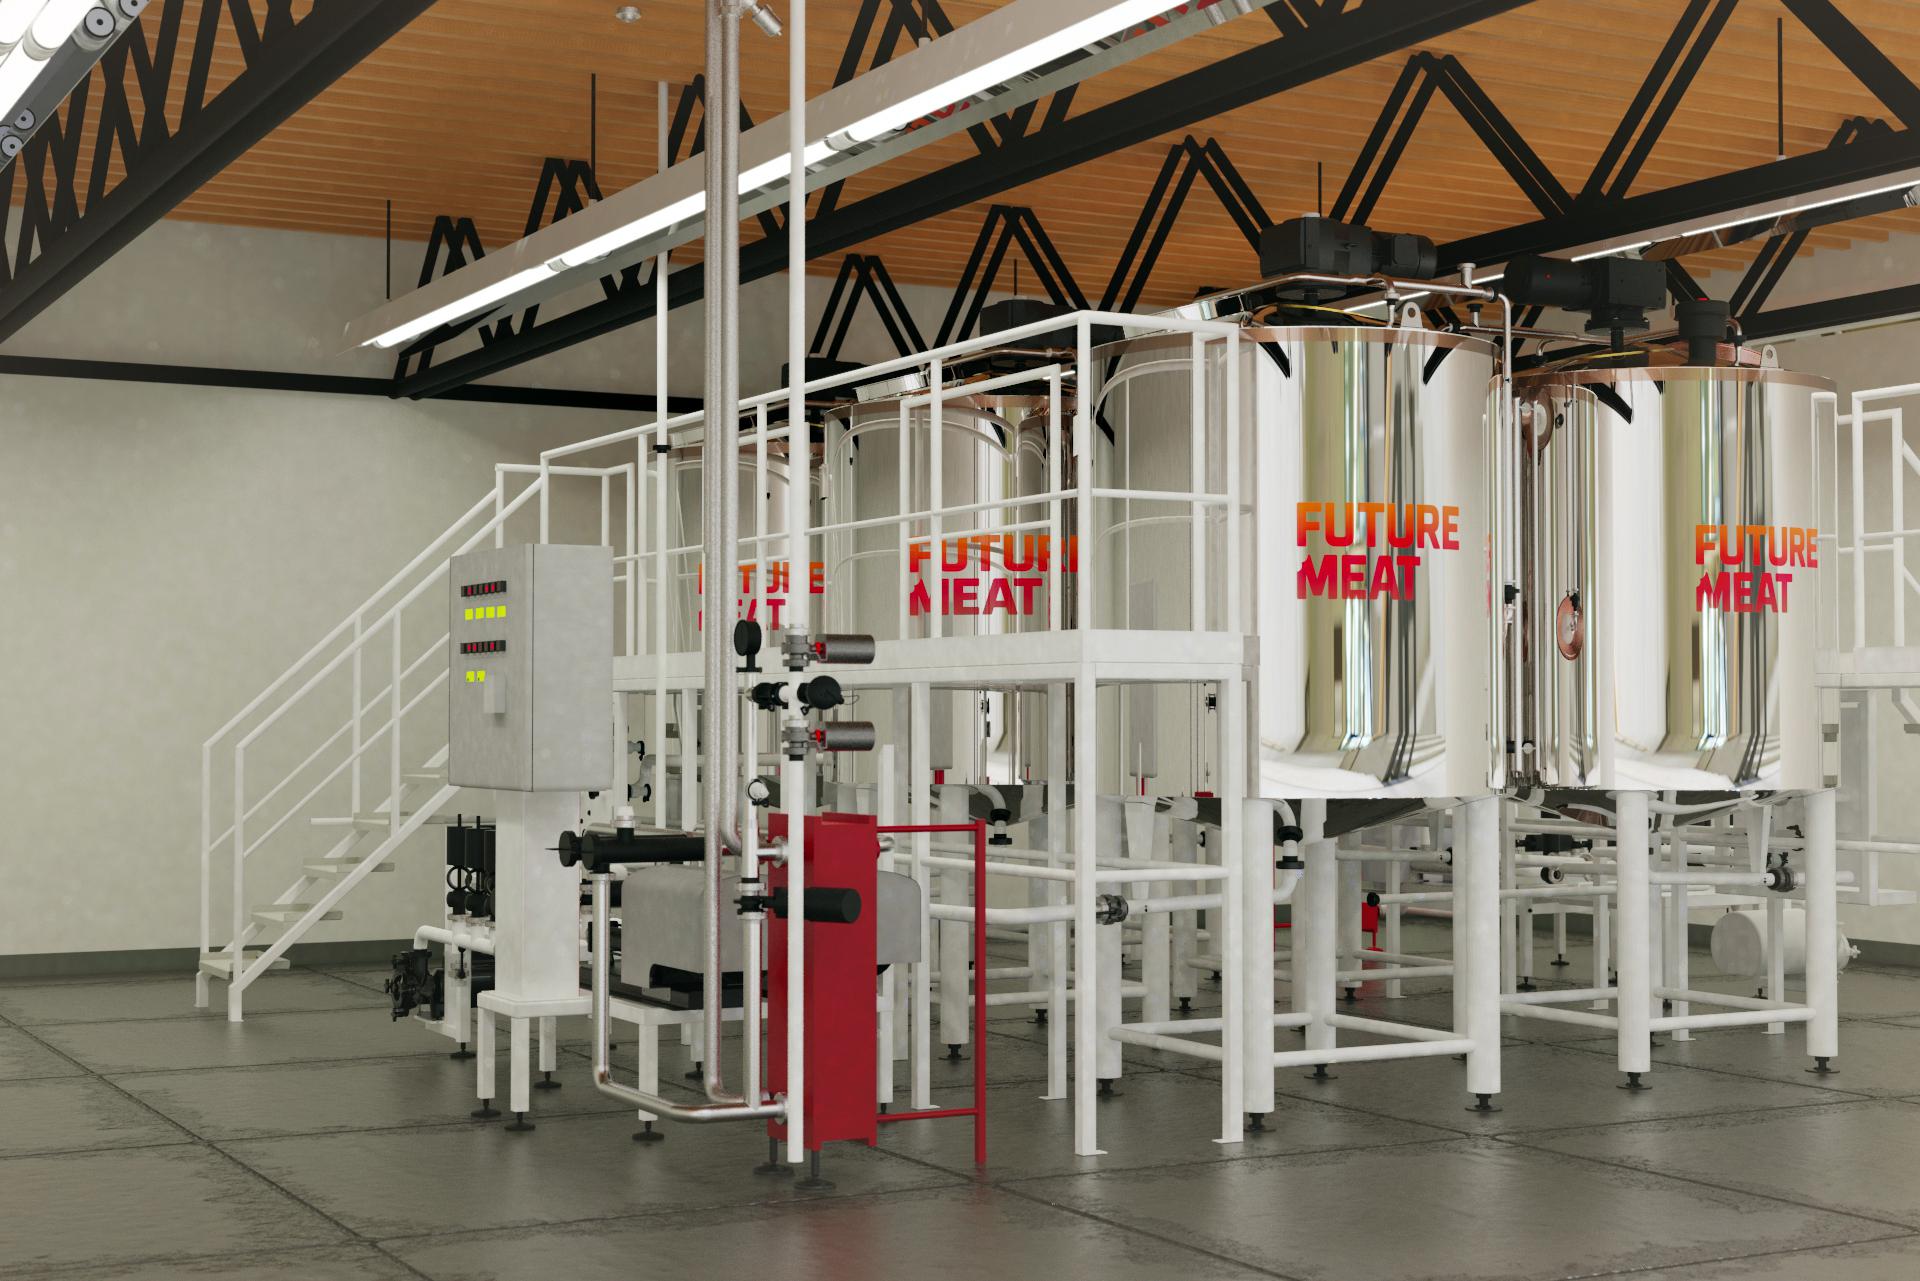 Future Meat production module